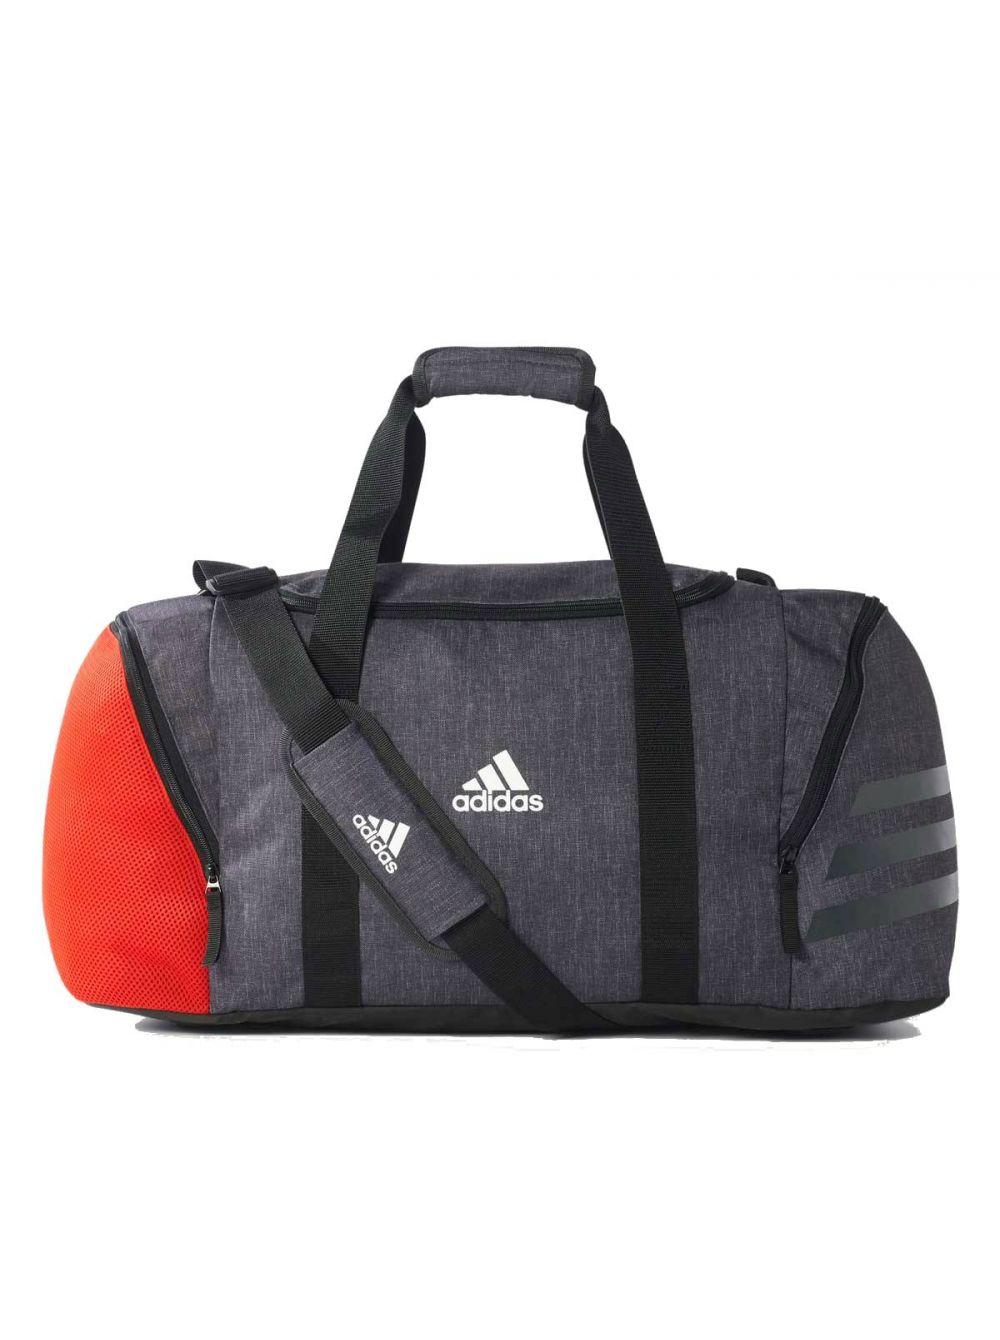 347f8bab984c Купить спортивную сумку «Adidas Ace 17.2 Teambag M» серо-красную